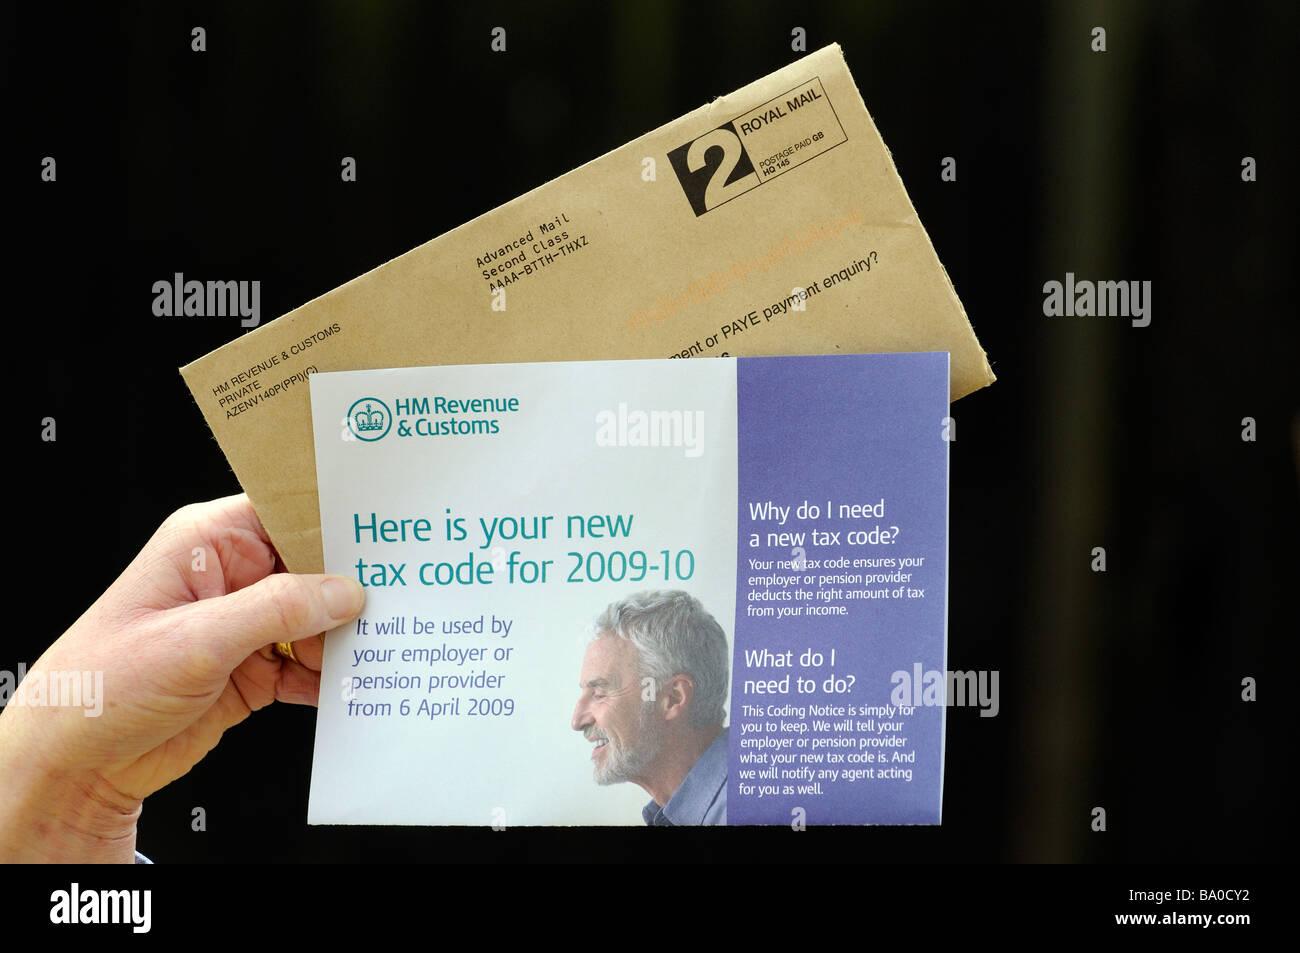 HM Revenue Customs new tax code documentation document Stock Photo